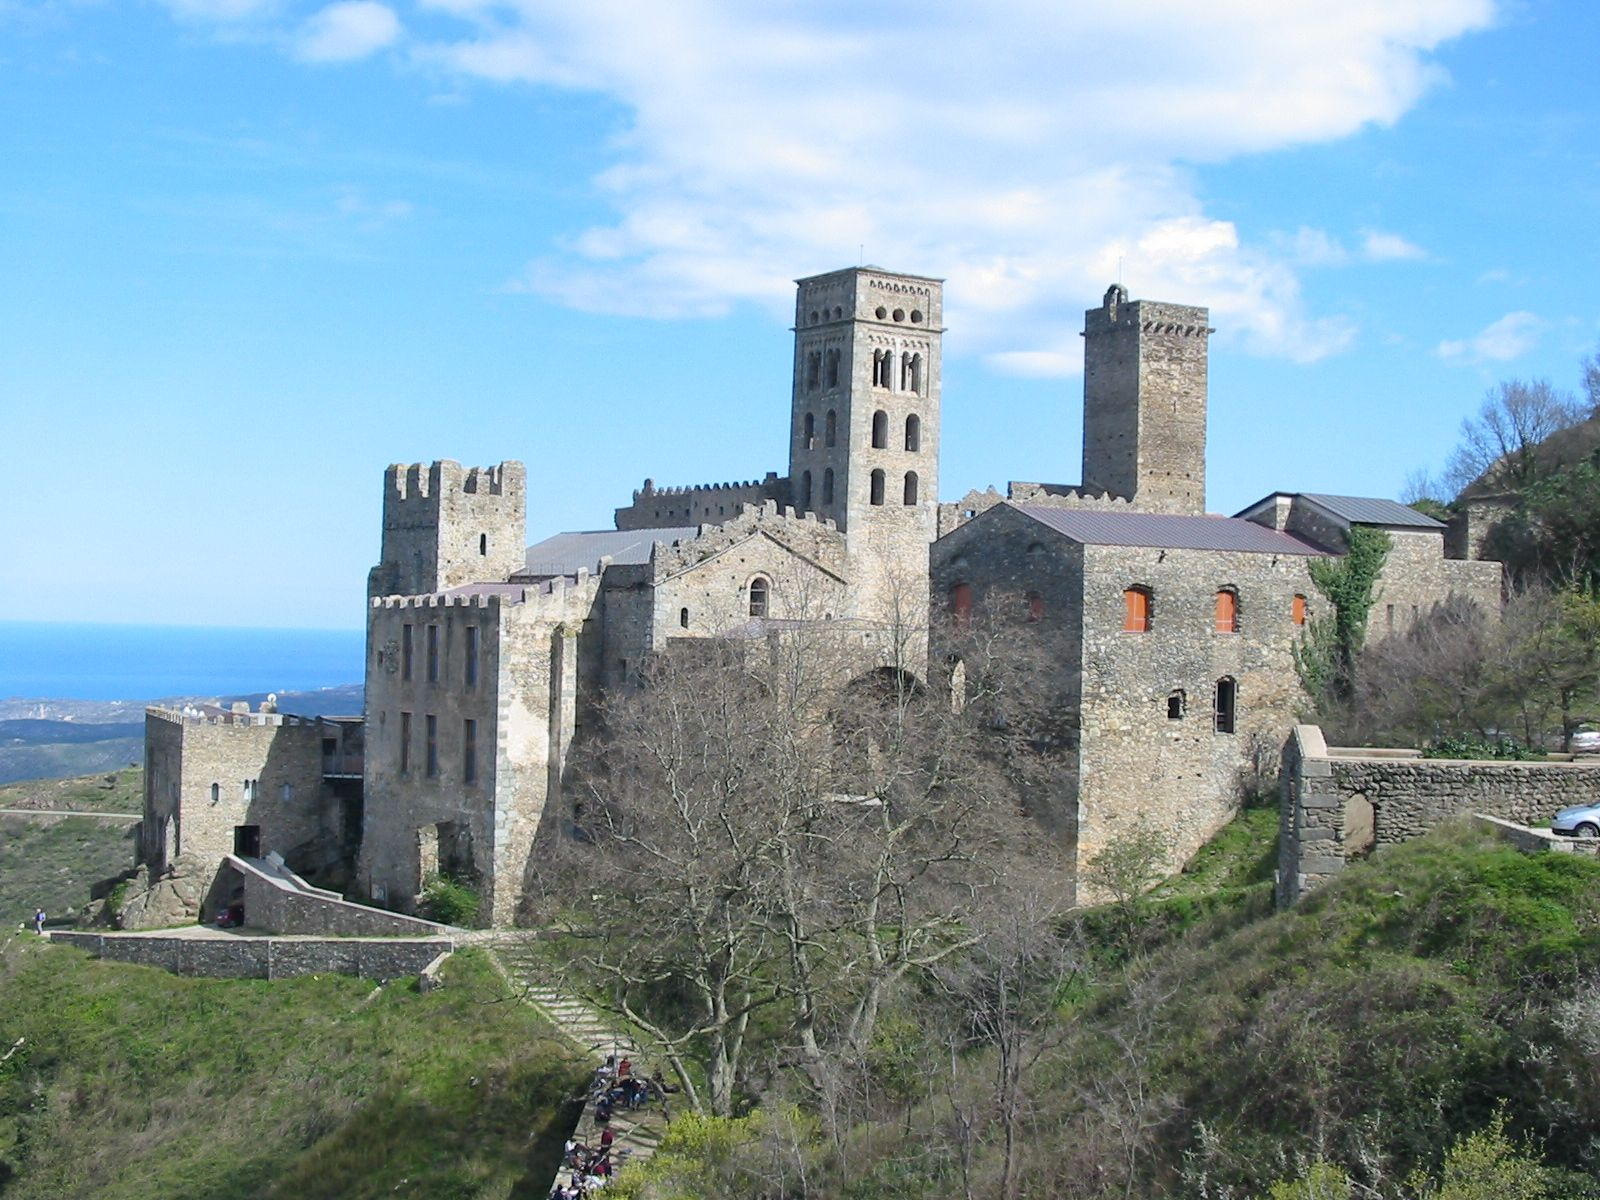 san pedro de roda | File:Sant Pere de Rodes.JPG - Wikimedia Commons